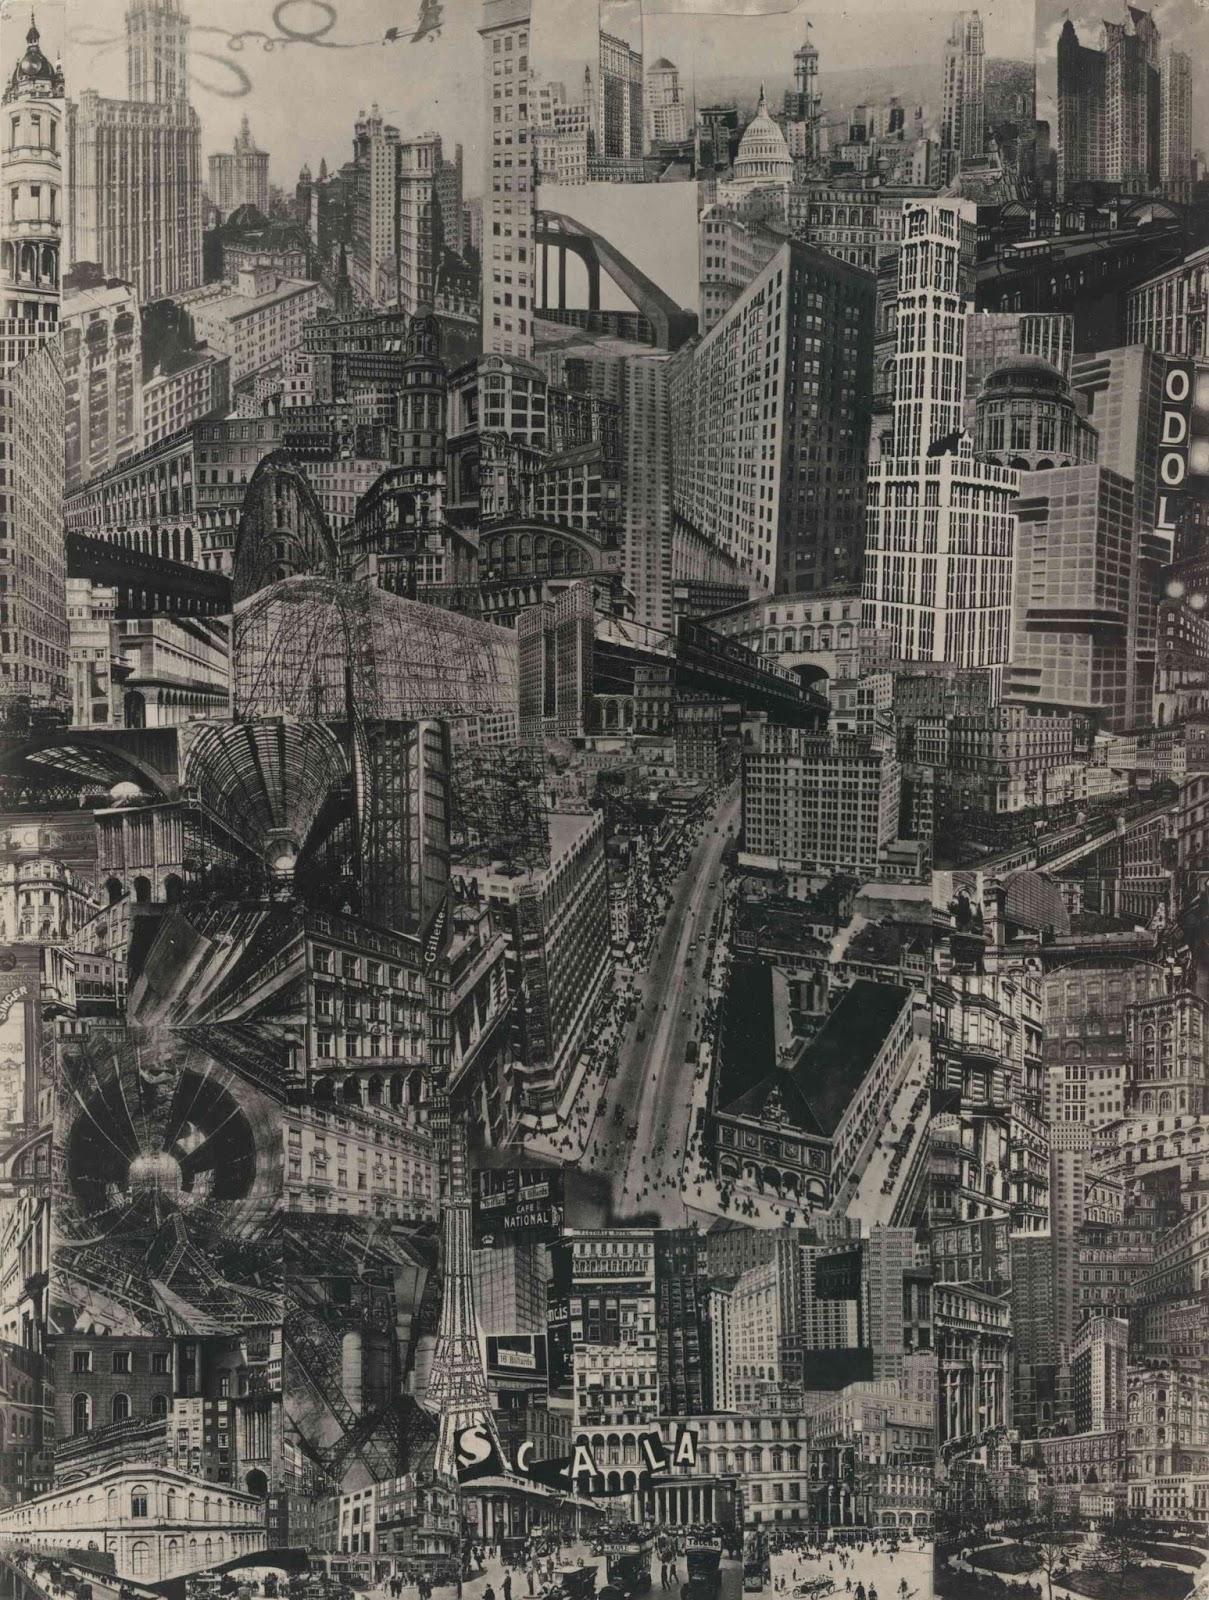 Paul Citeron. Metropolis. 1923.